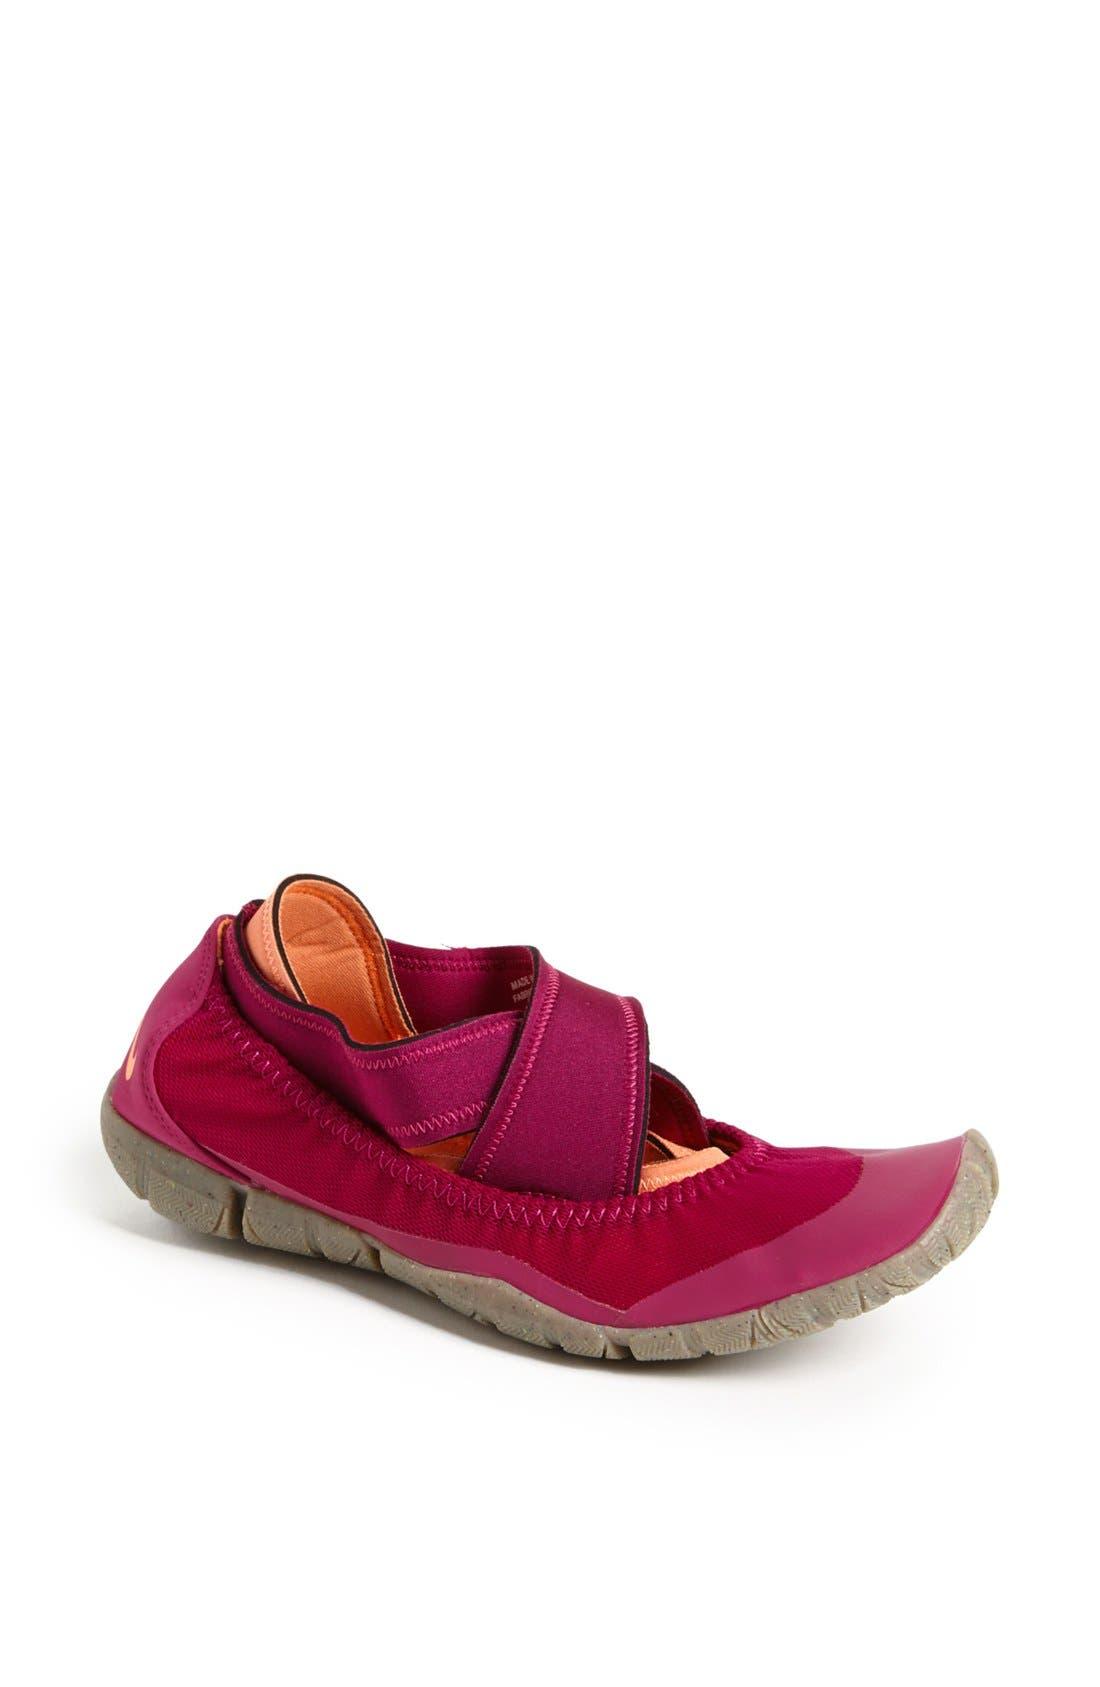 Main Image - Nike 'Studio Wrap Pack' Yoga Training Shoe (Women)